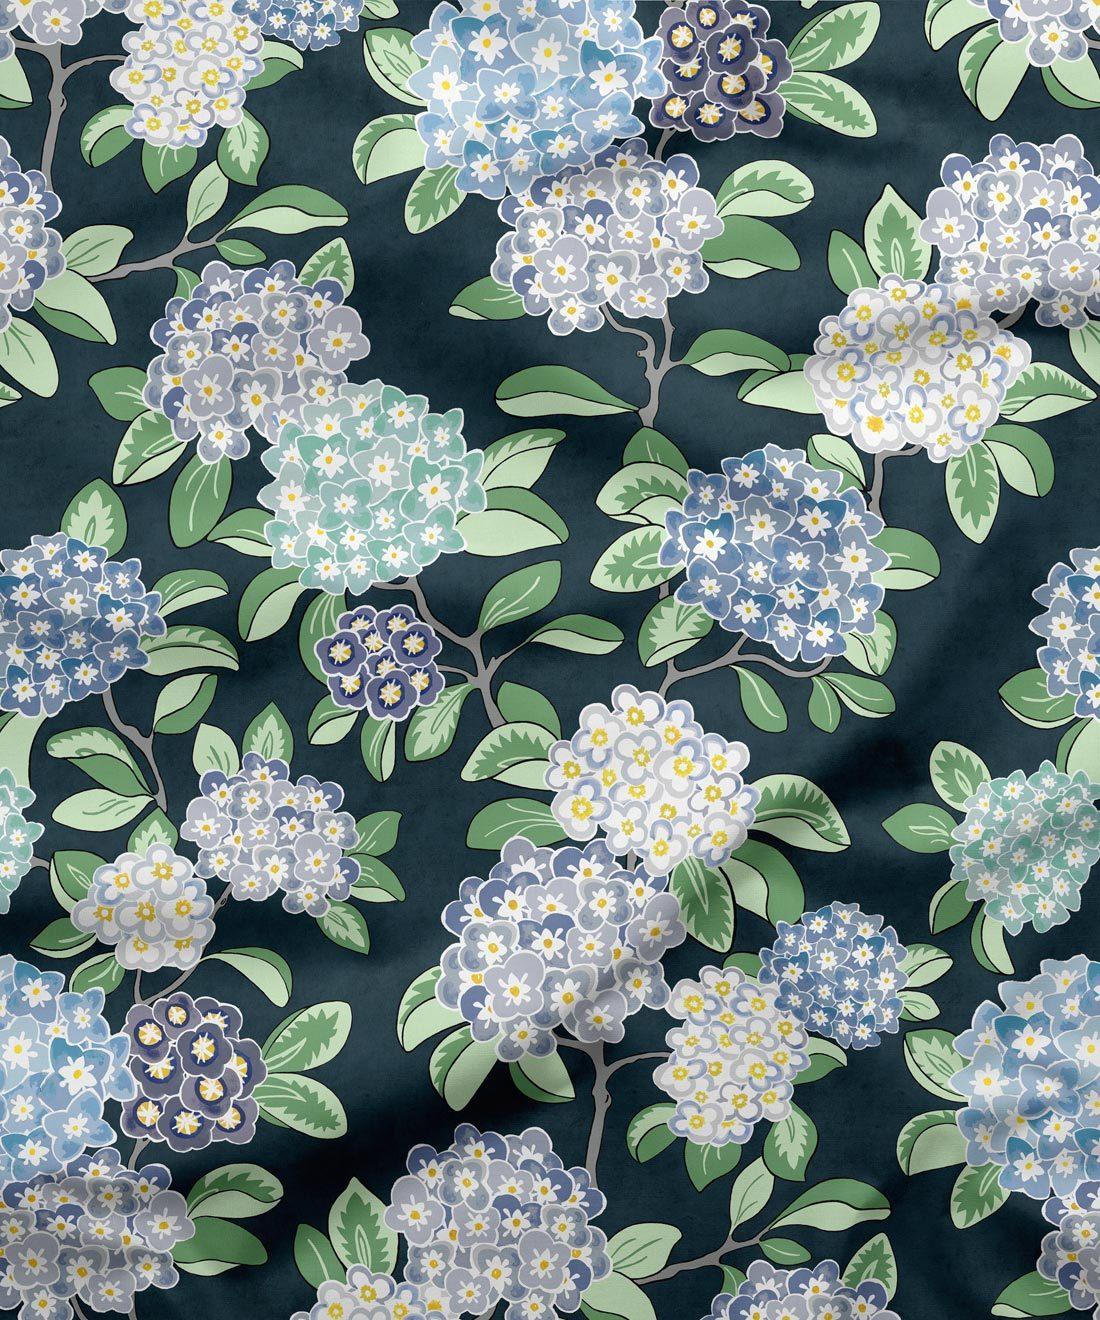 Hydrangea Fabric Navy